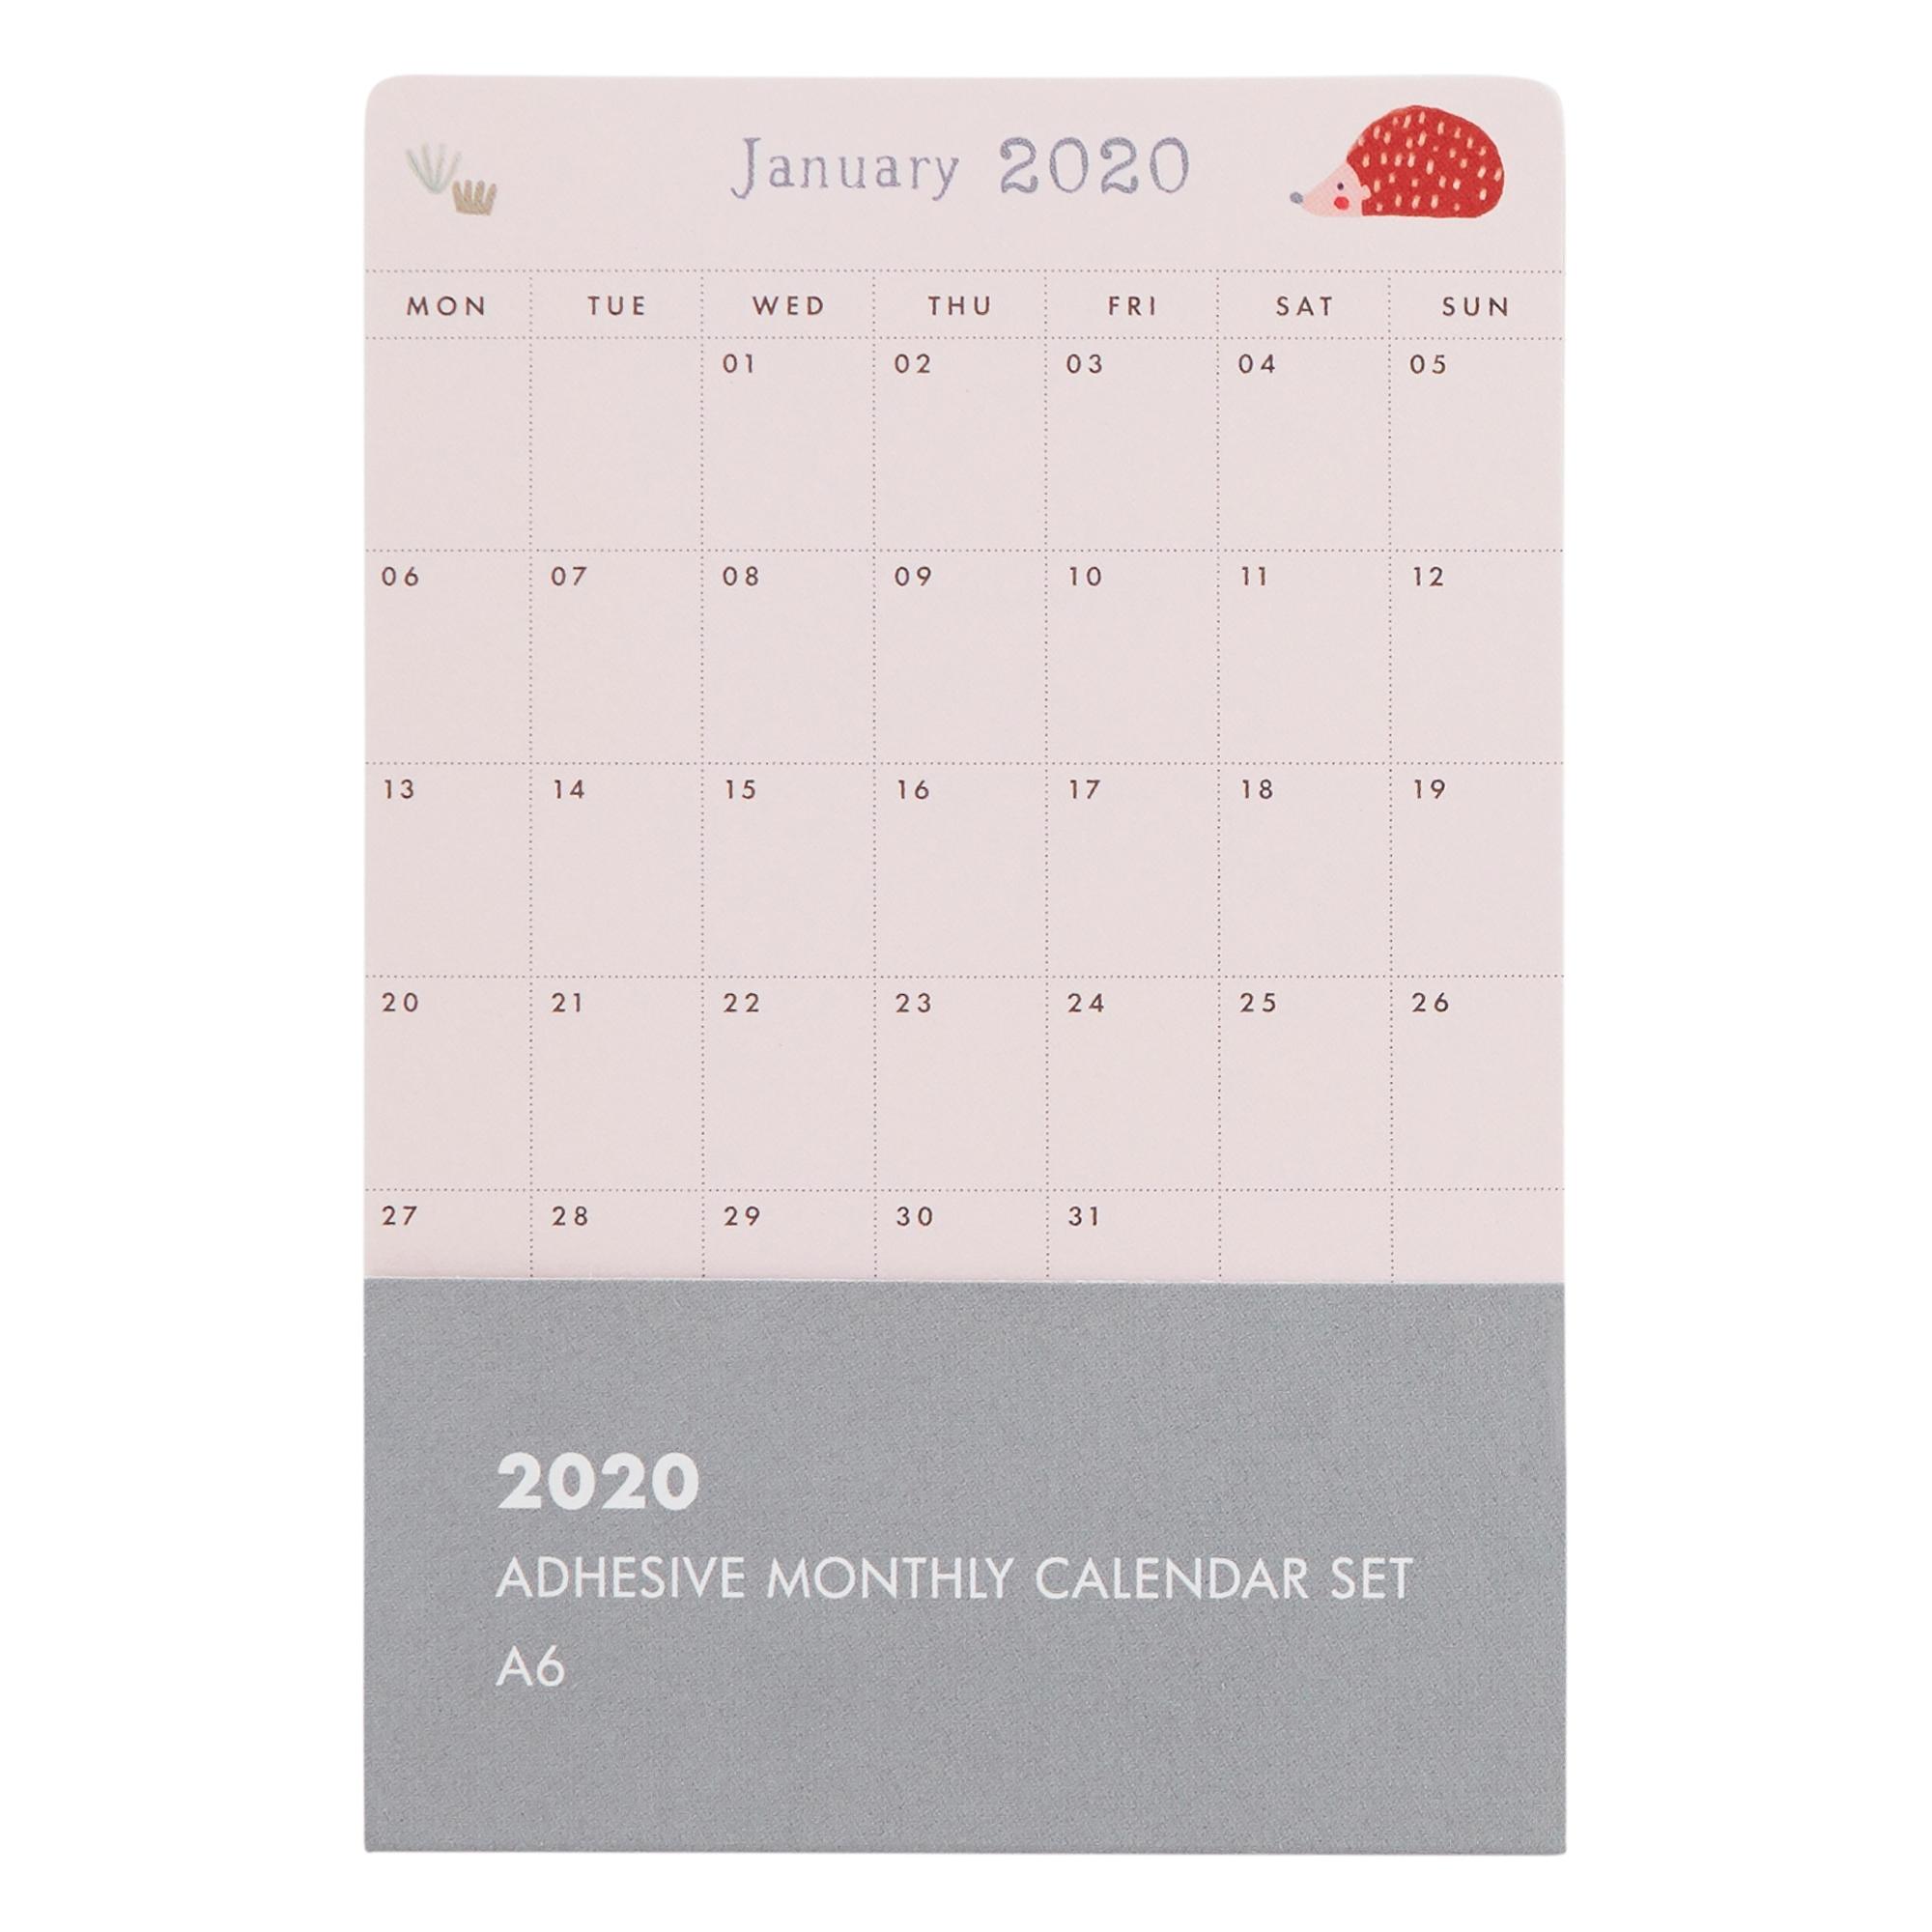 2020 Sweet Adhesive Monthly Calendar Set: Woodland